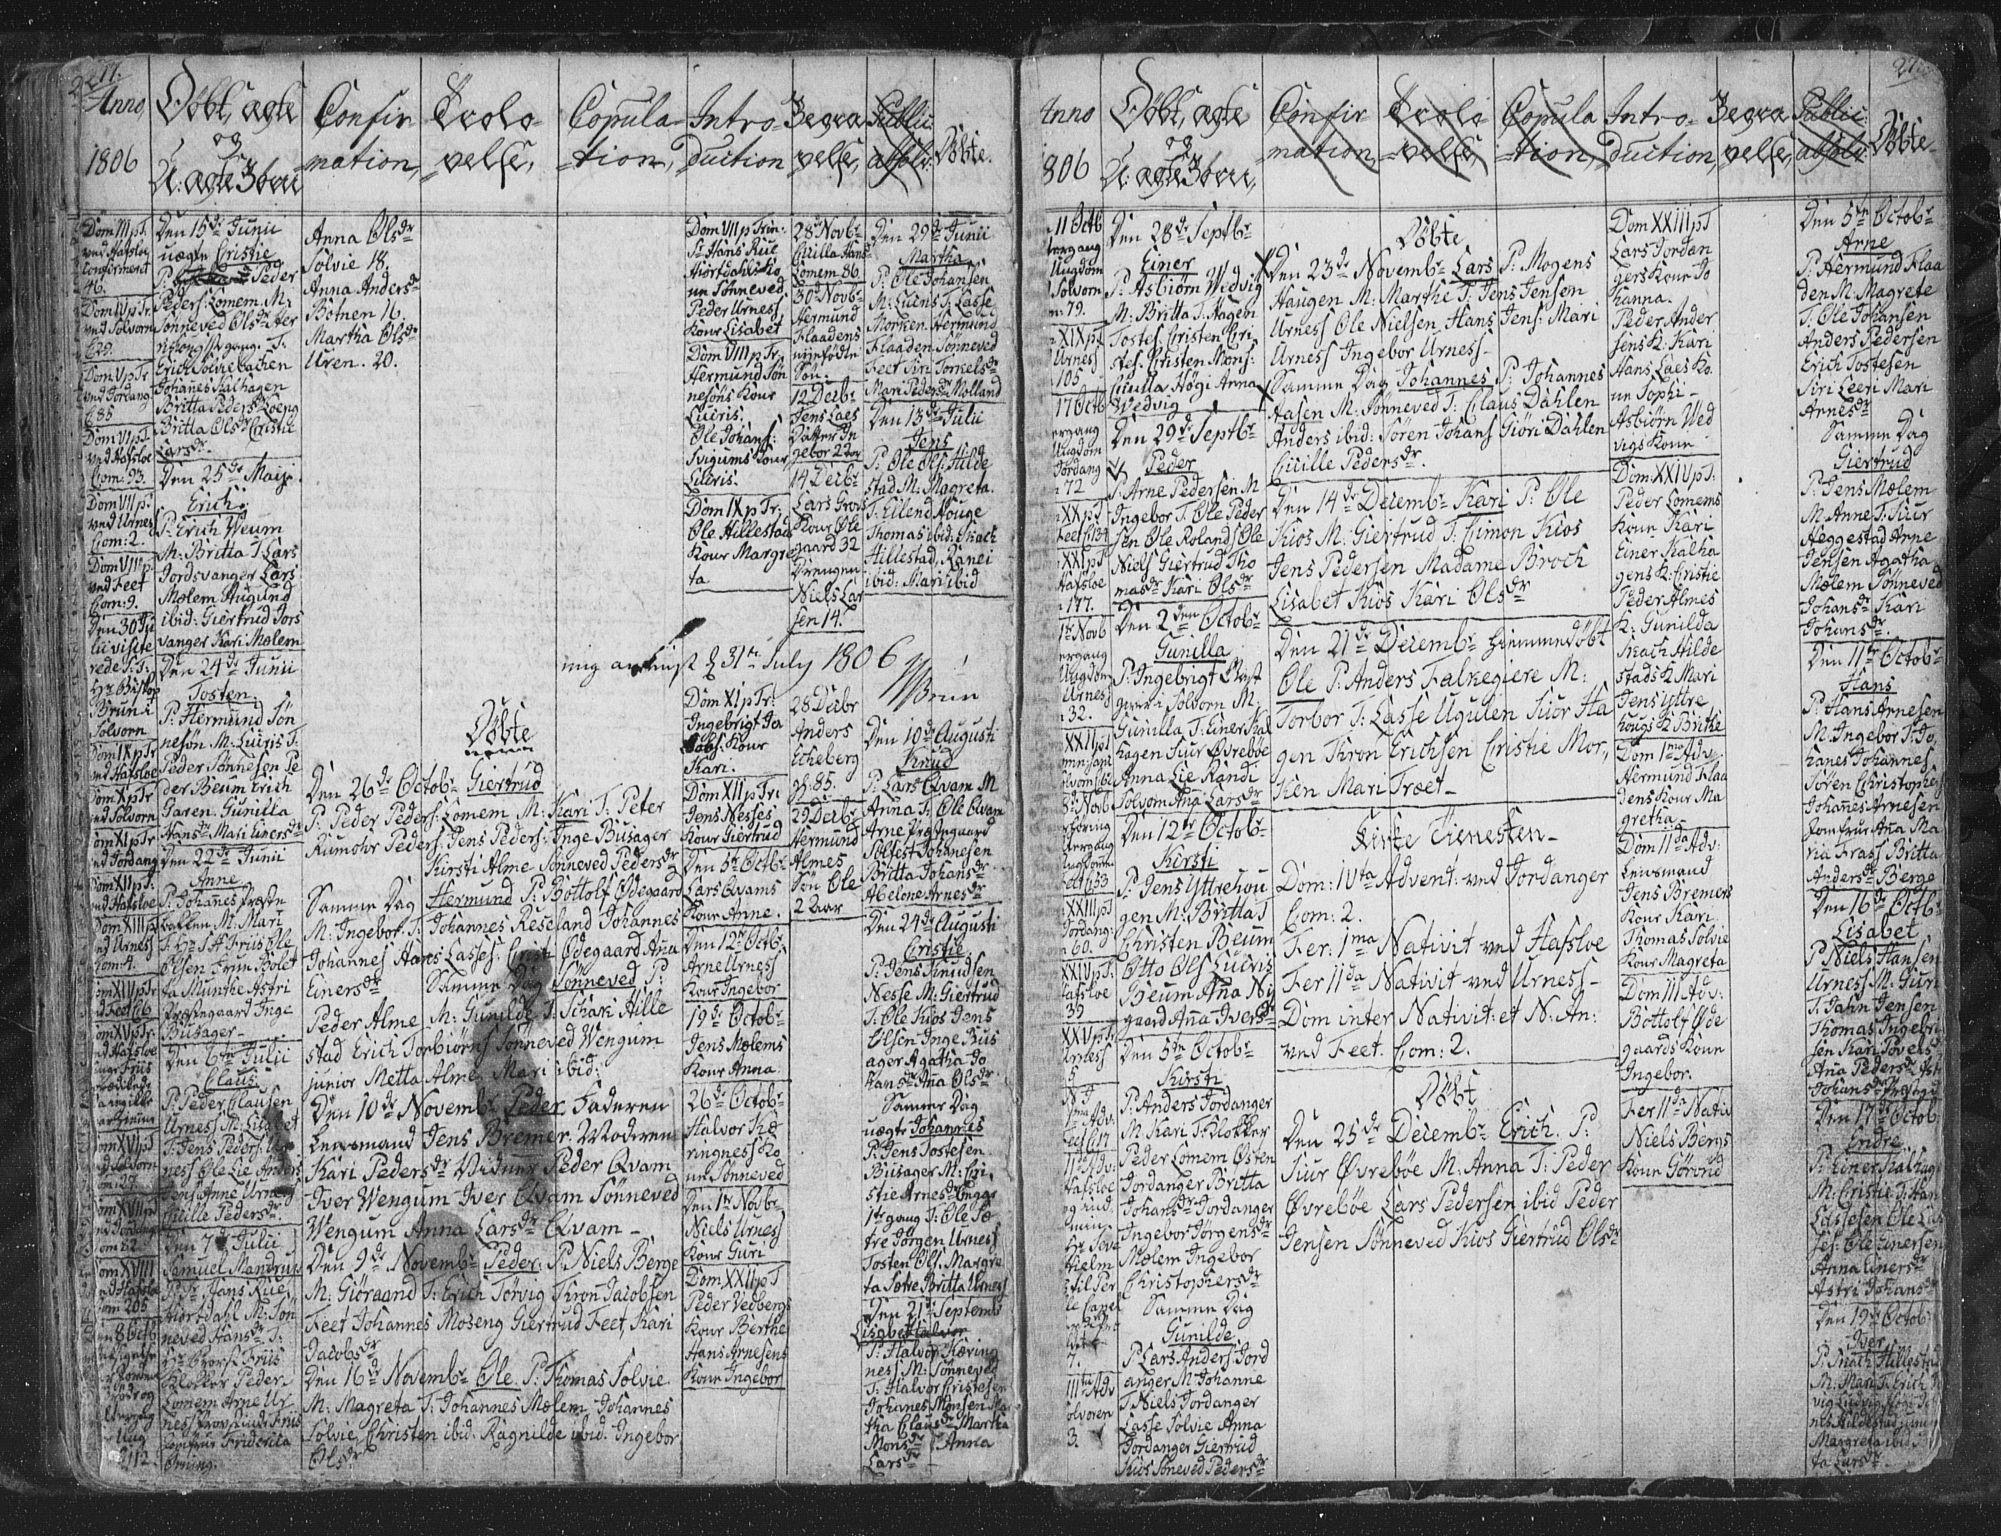 SAB, Hafslo sokneprestembete, H/Haa/Haaa/L0002: Ministerialbok nr. A 2, 1755-1806, s. 277-278